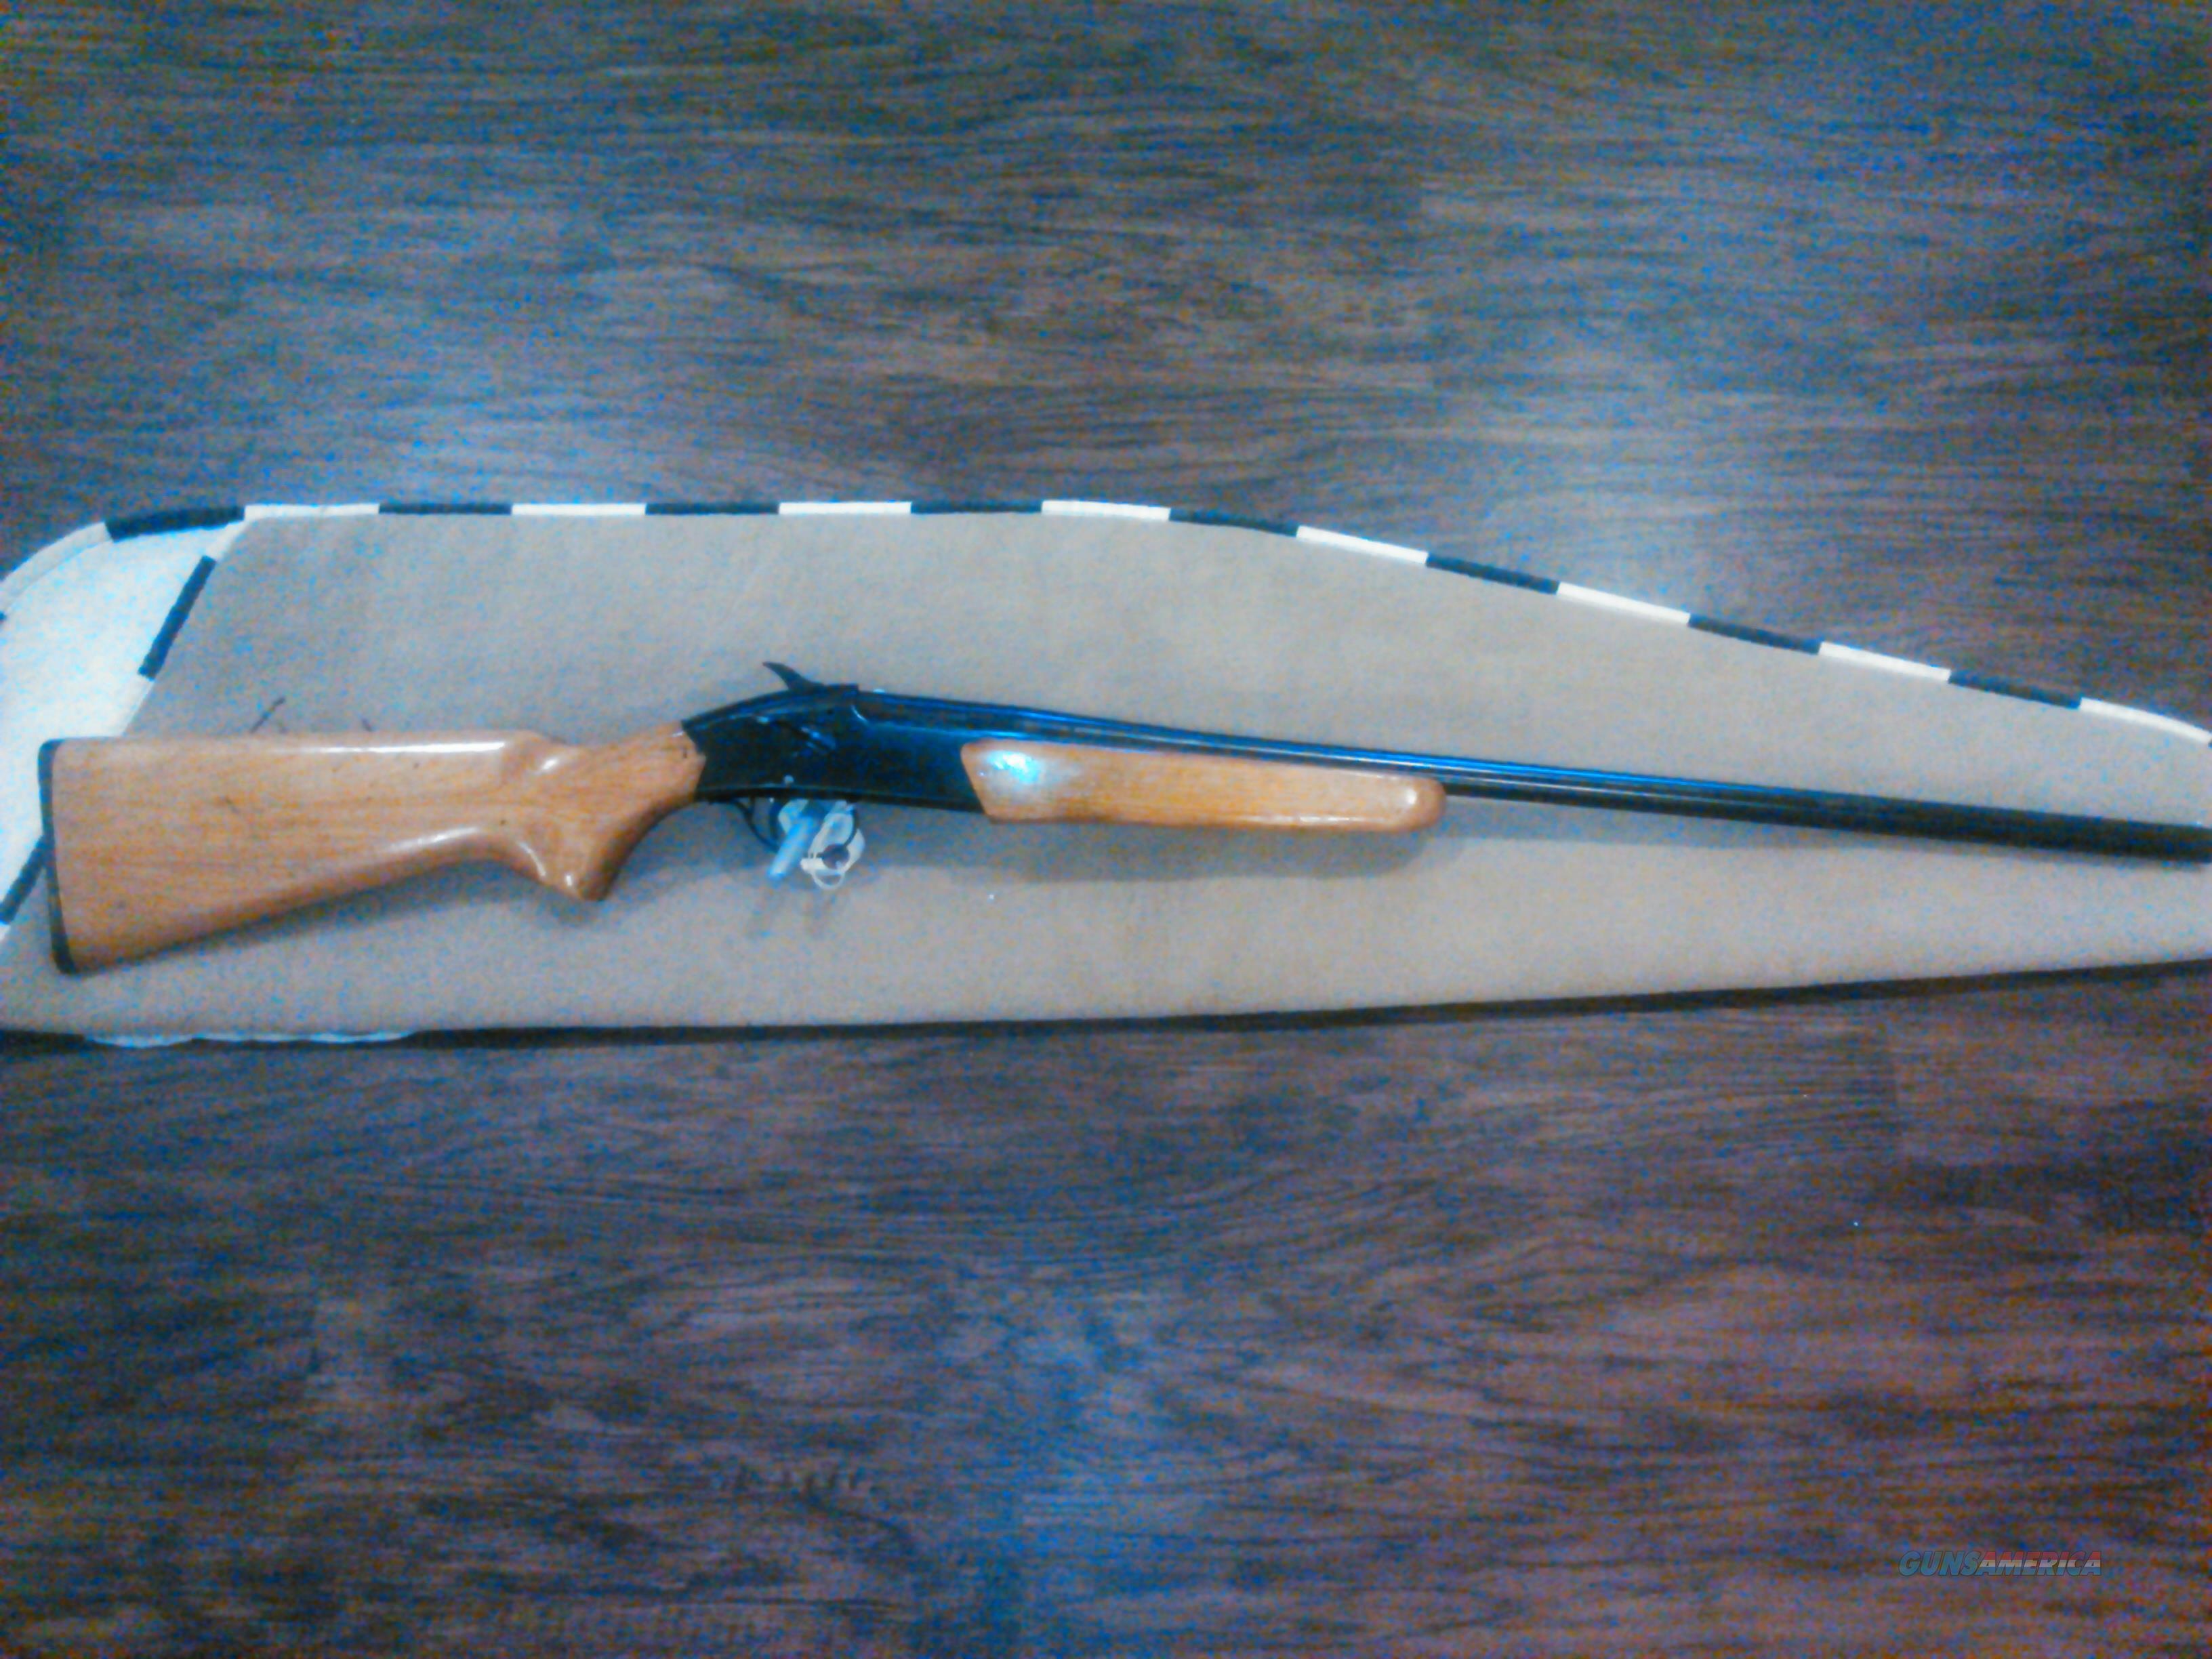 "STEVENS MODEL 940E 20GA 3"" 28""BL, FREE SHIPPING NO CC FEE  Guns > Shotguns > Smith & Wesson Shotguns > Pump Action"